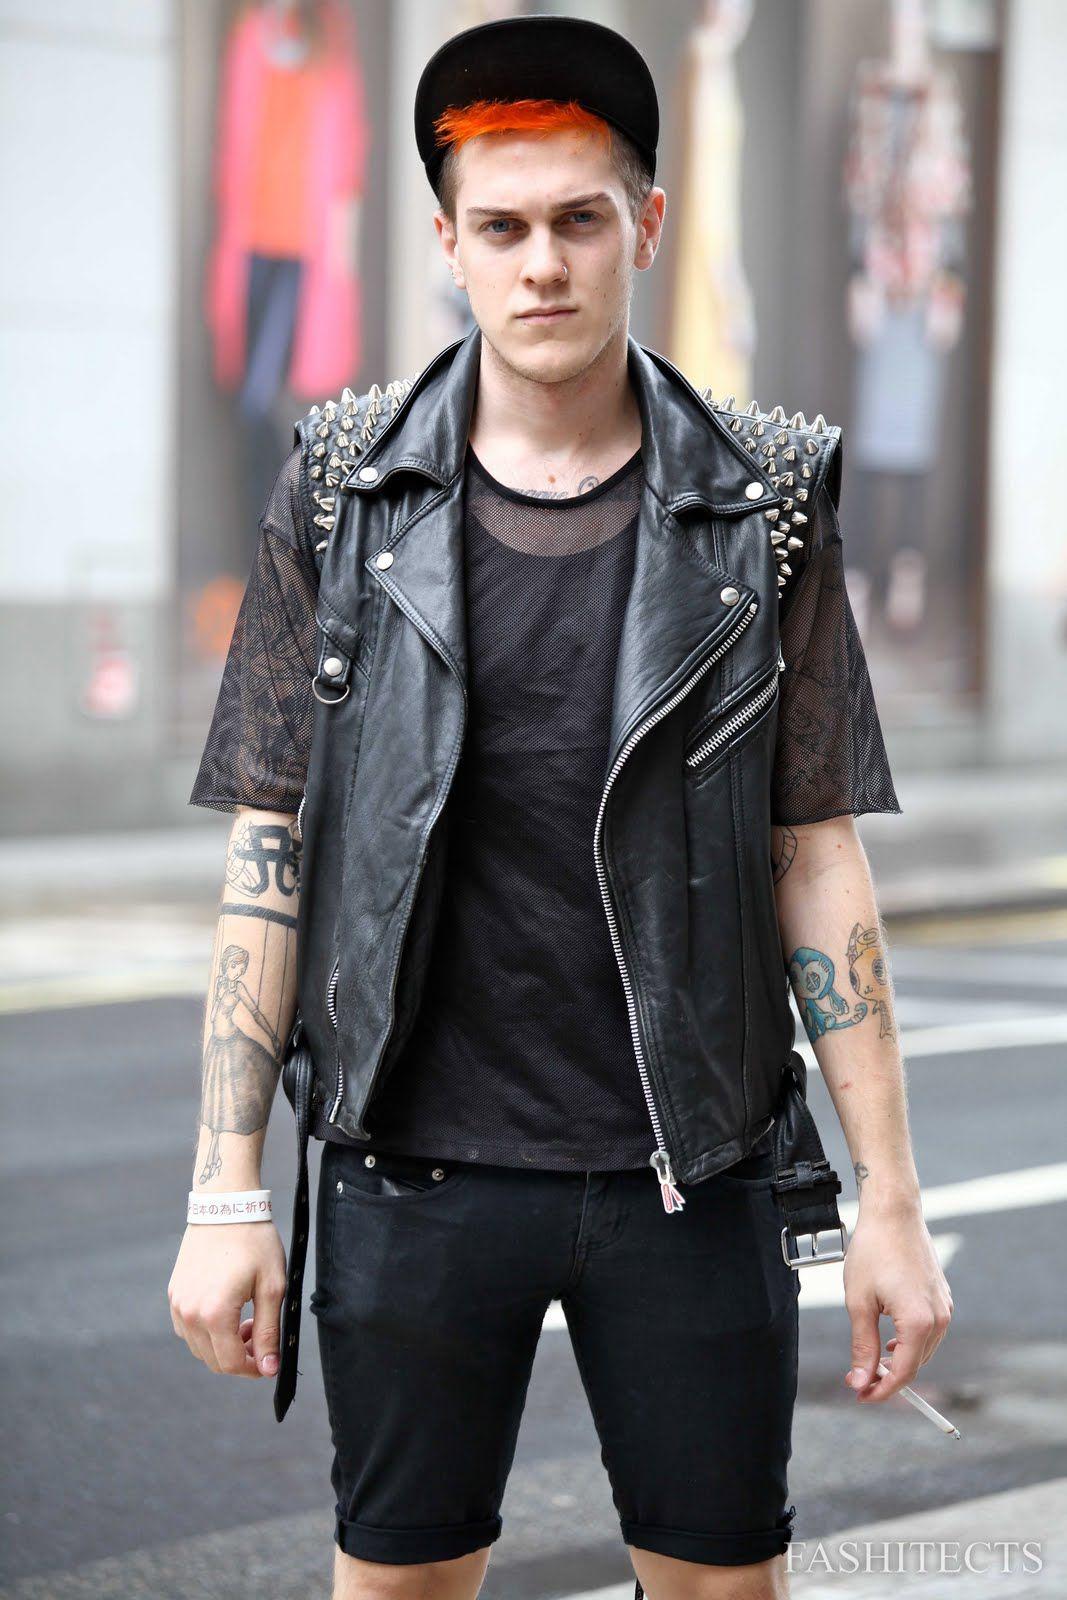 Biker Punk Boy Pinterest Mens Biker Style